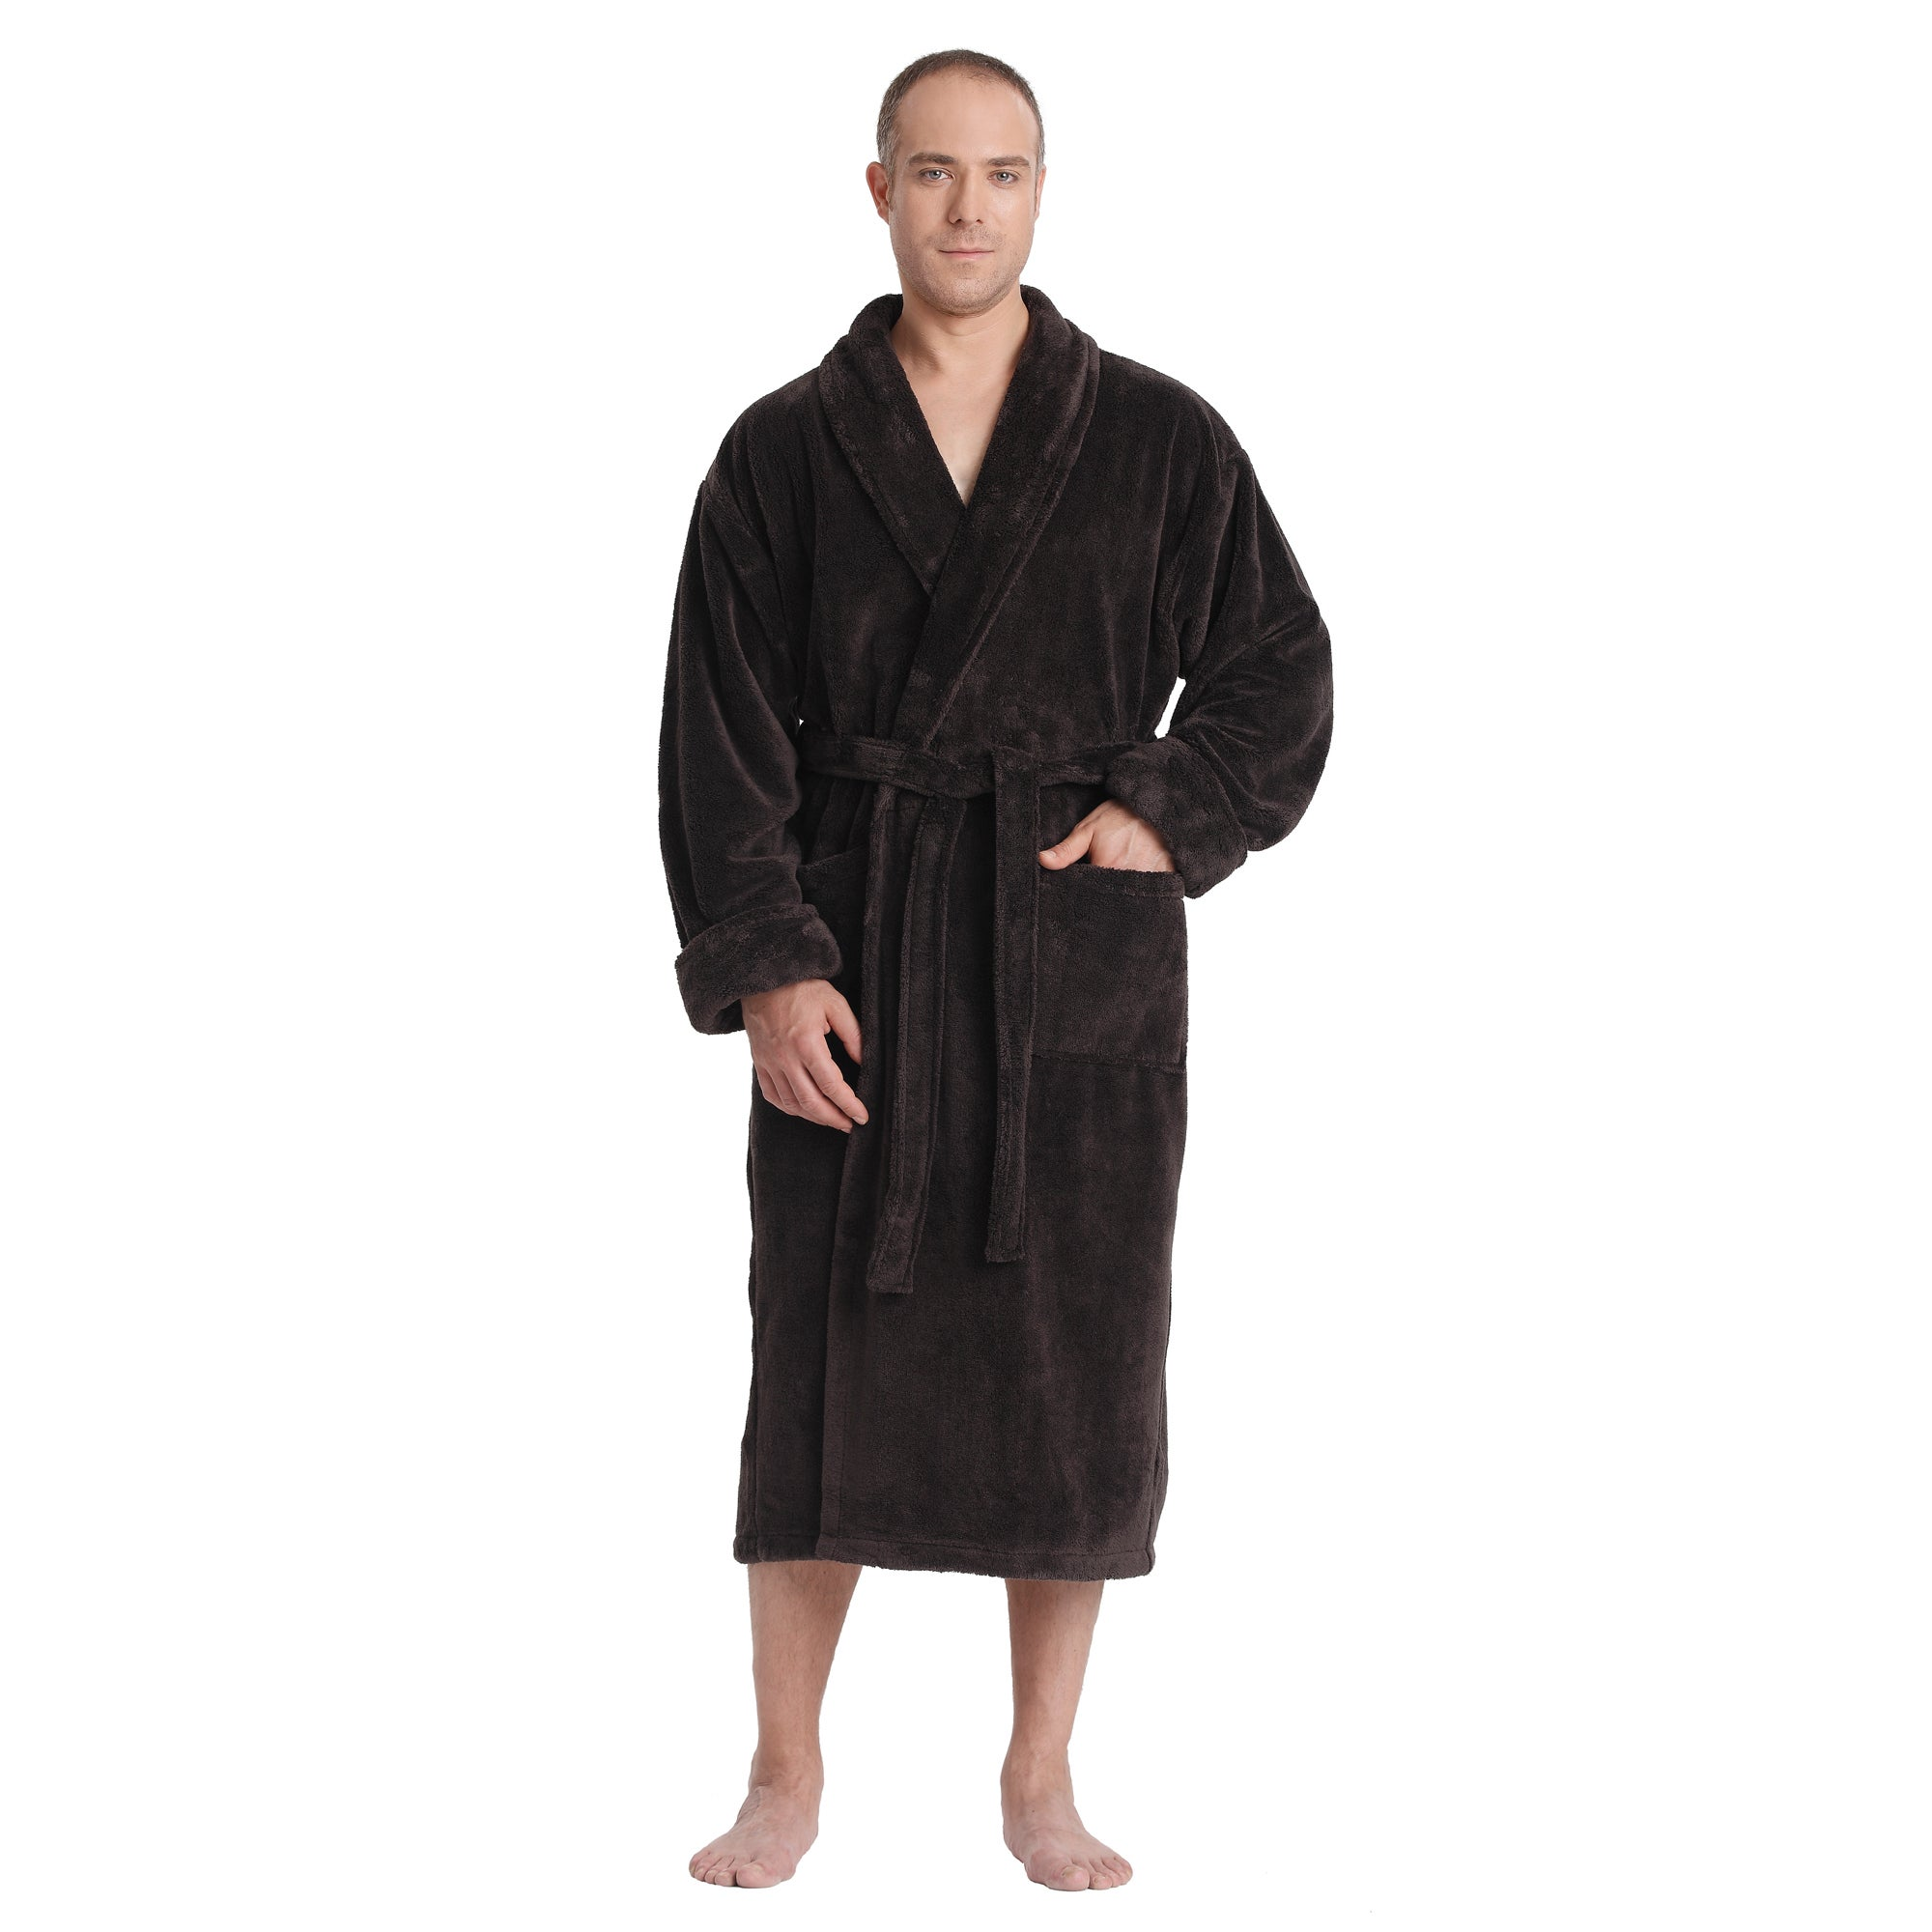 c8b0c85ea4 Shop Men s Satin Touch Shawl Fleece Bathrobe Turkish Soft Plush Robe ...